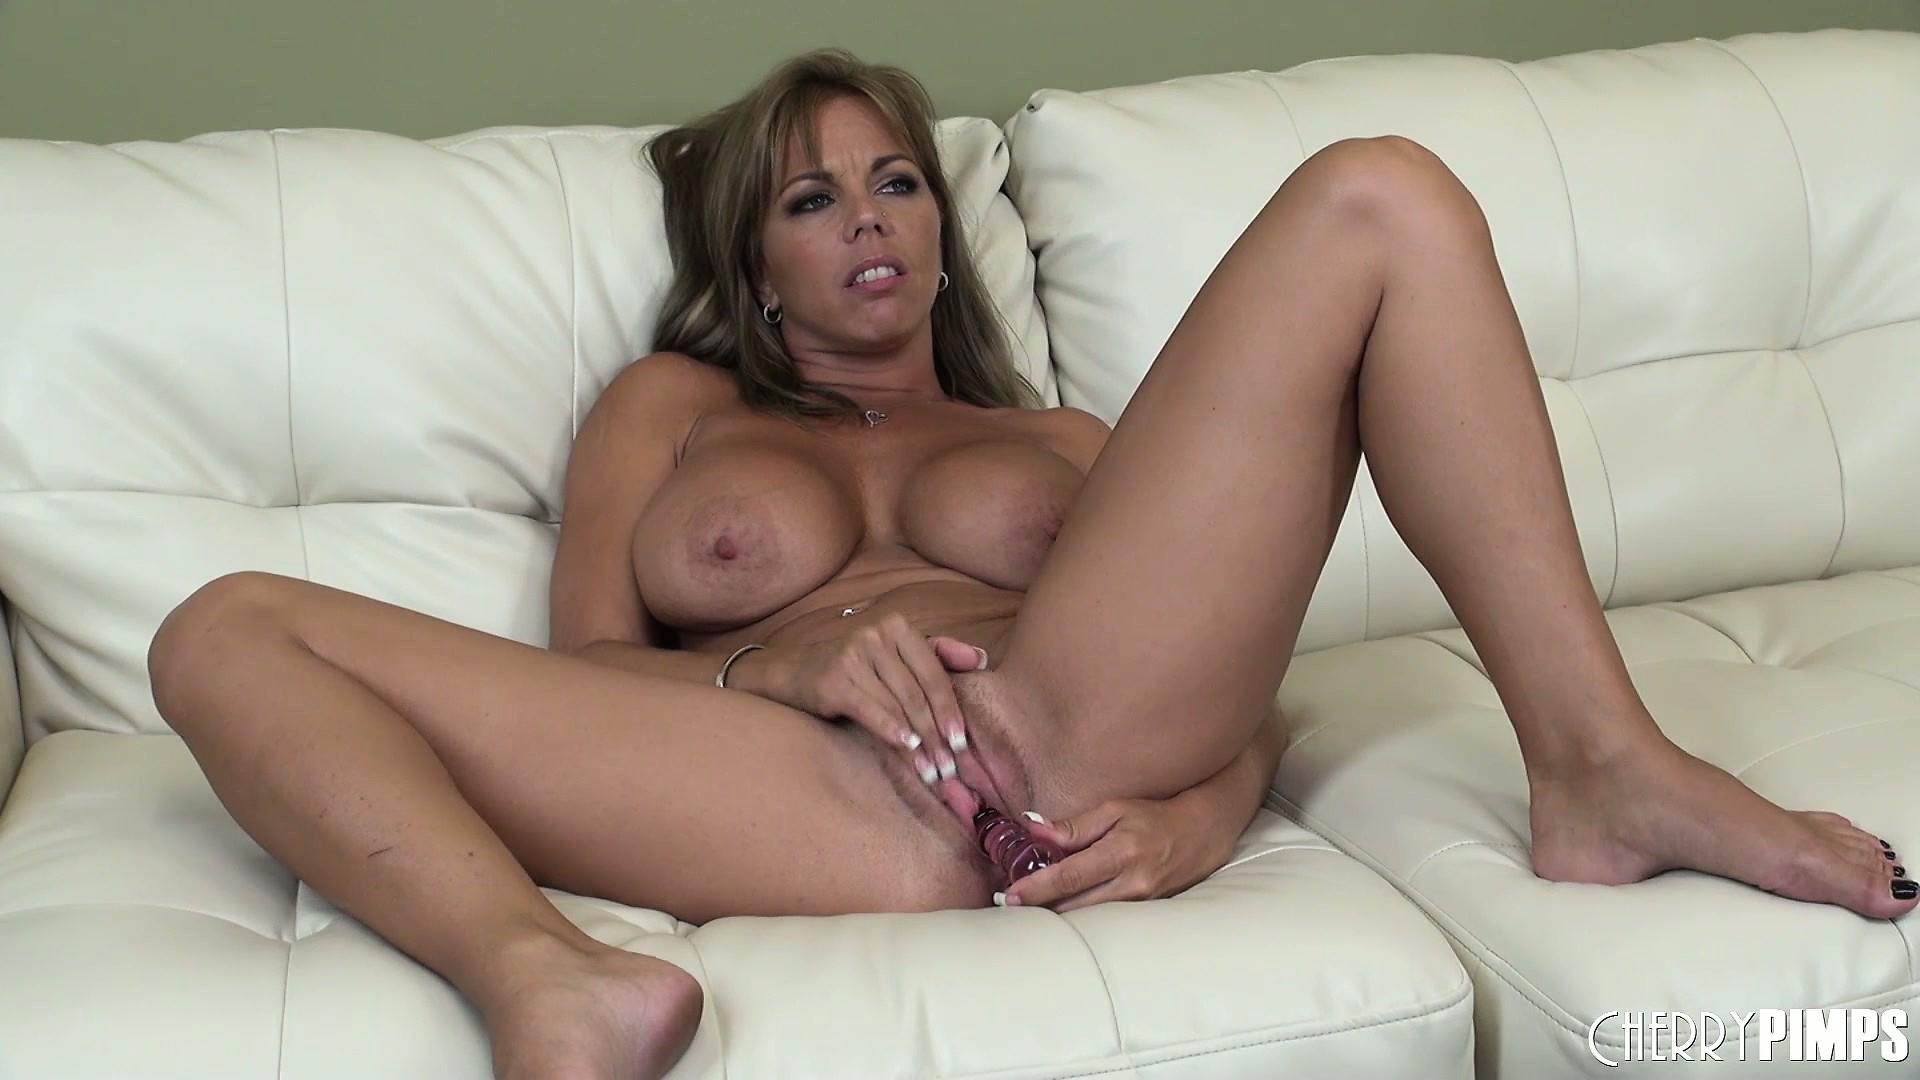 Amber Lynn Bach Porn Movies free mobile porn & sex videos & sex movies - passionate